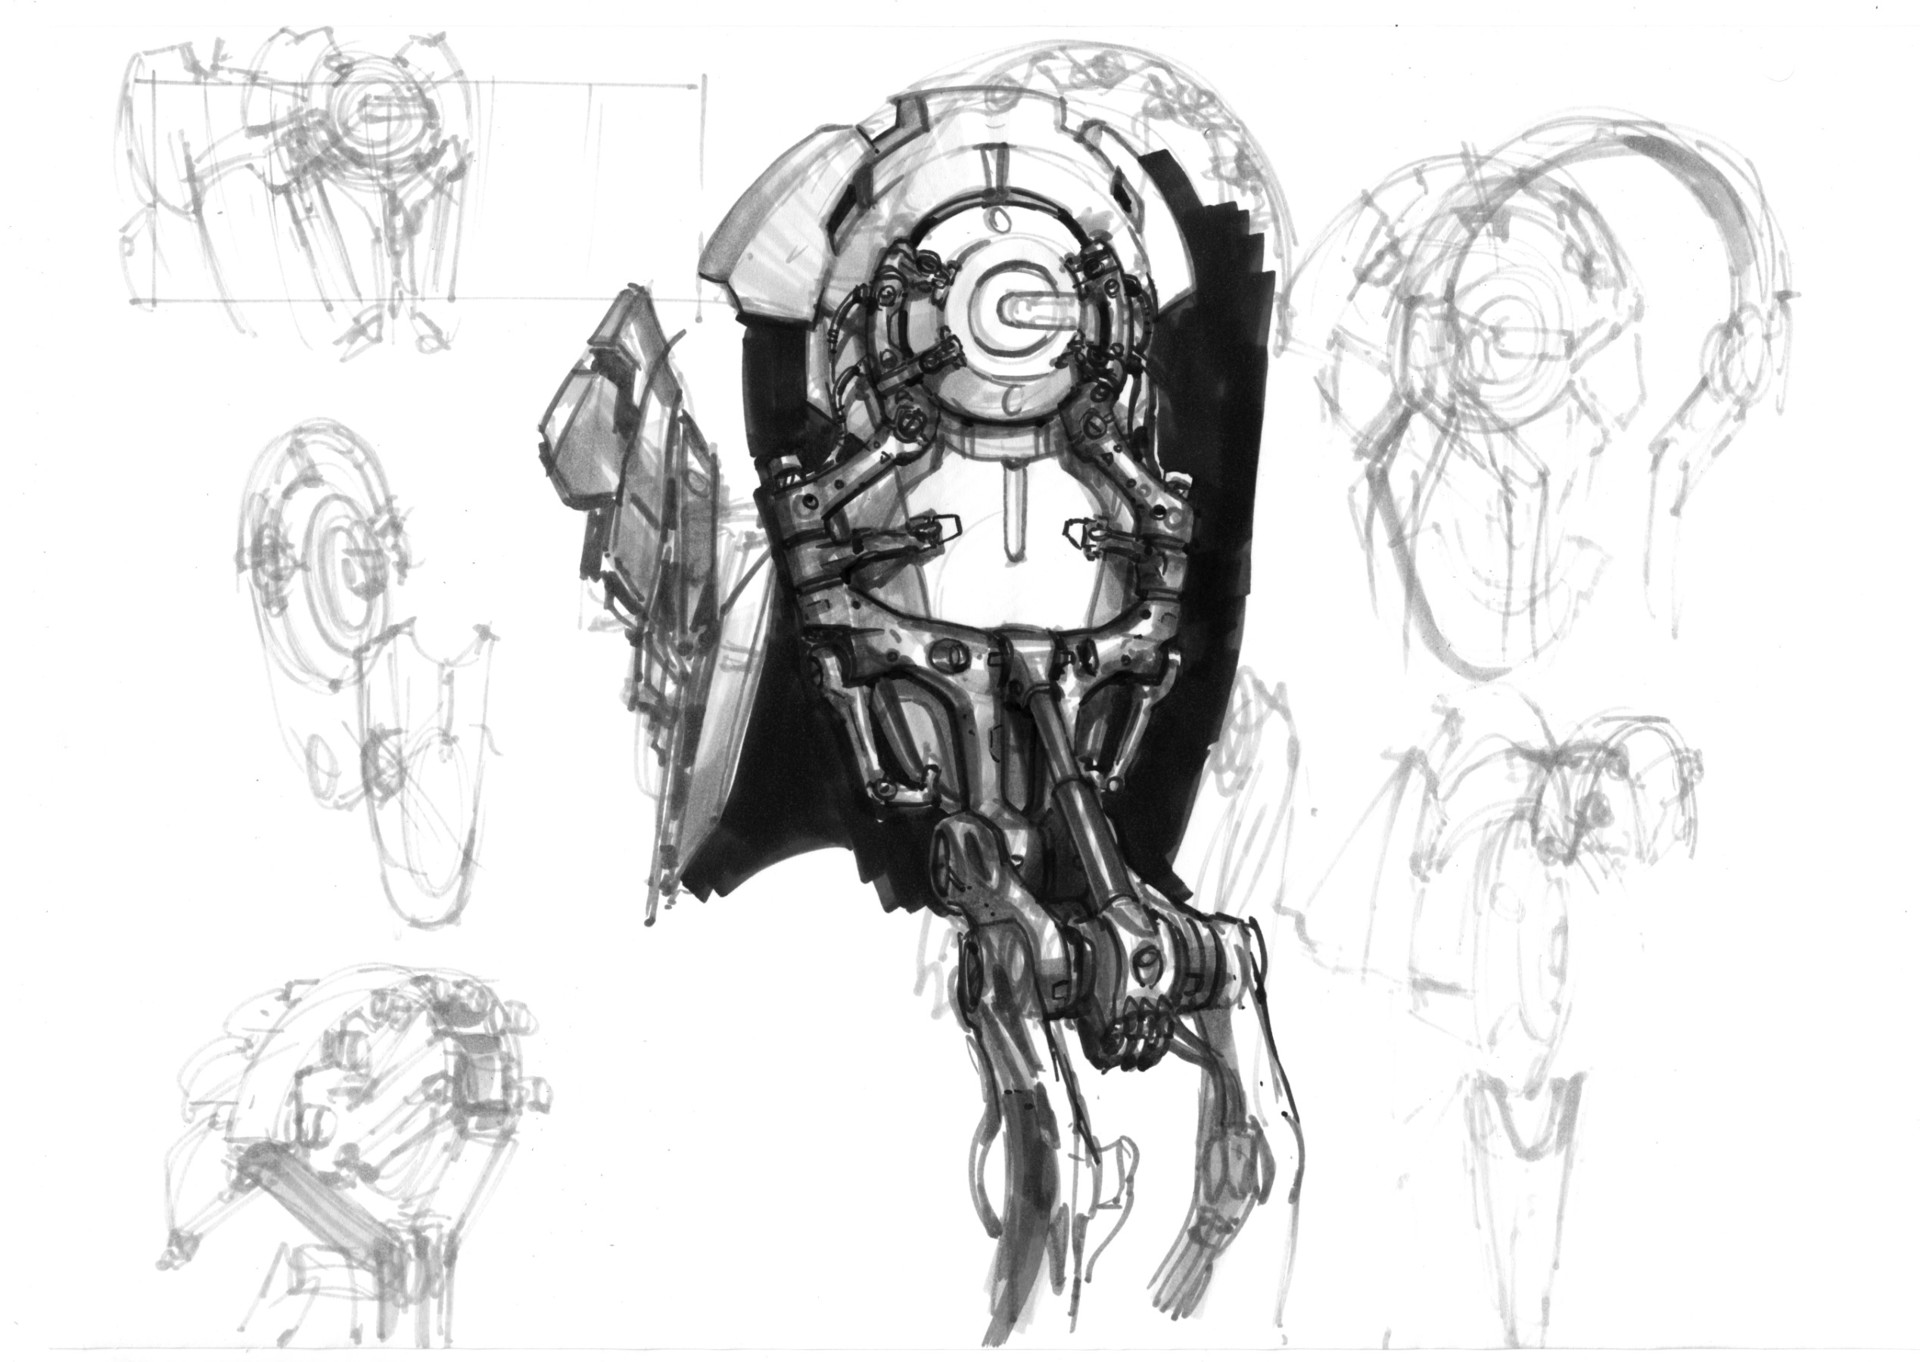 Phil saunders suit up sketch12